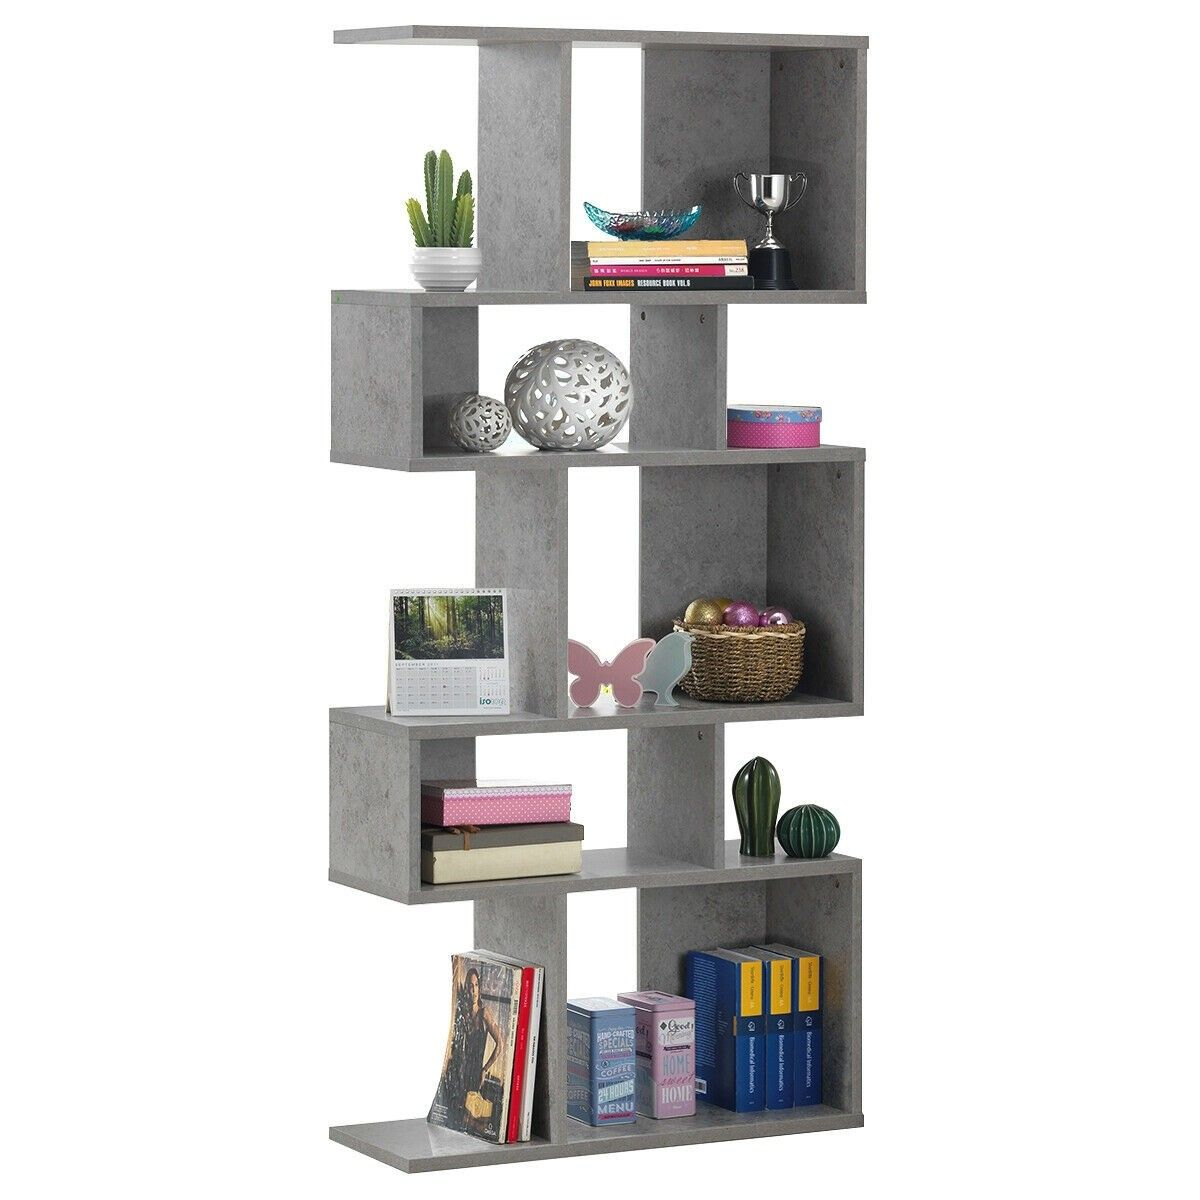 5 Cubes Ladder Shelf Corner Bookshelf Display Rack Bookcase In